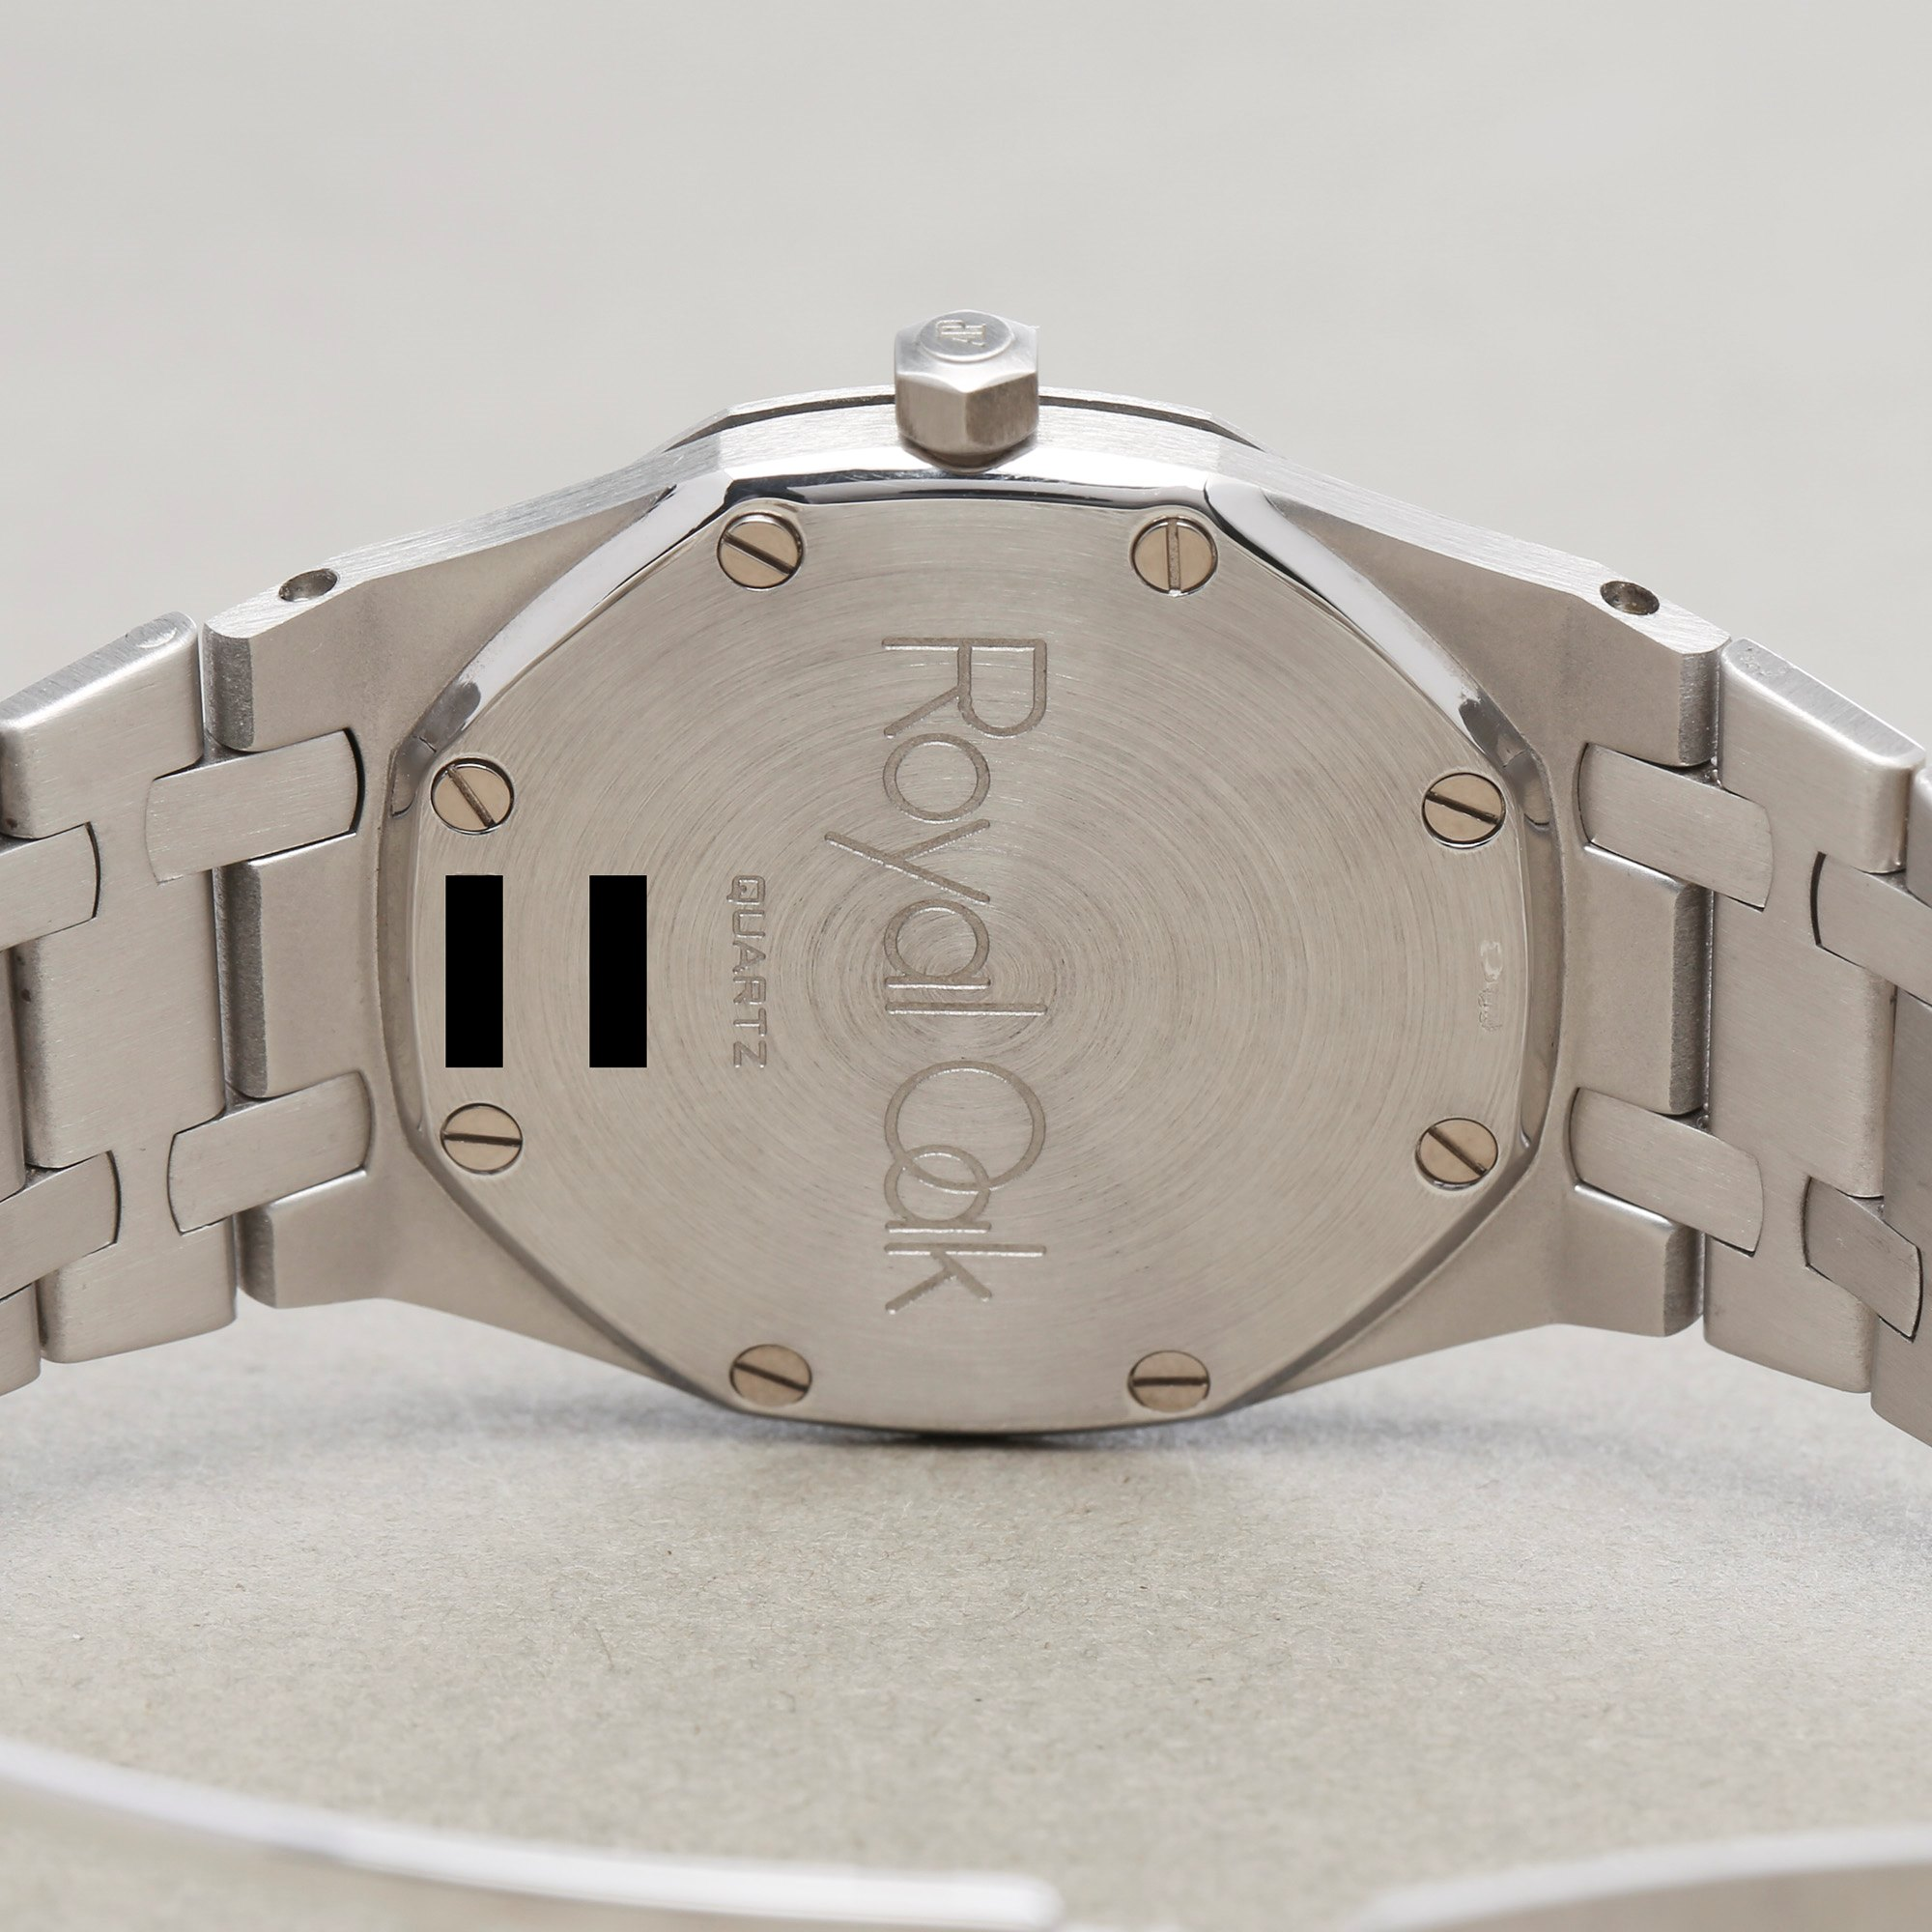 Audemars Piguet Royal Oak 18K White Gold 56175BC.OO.0789BC.01